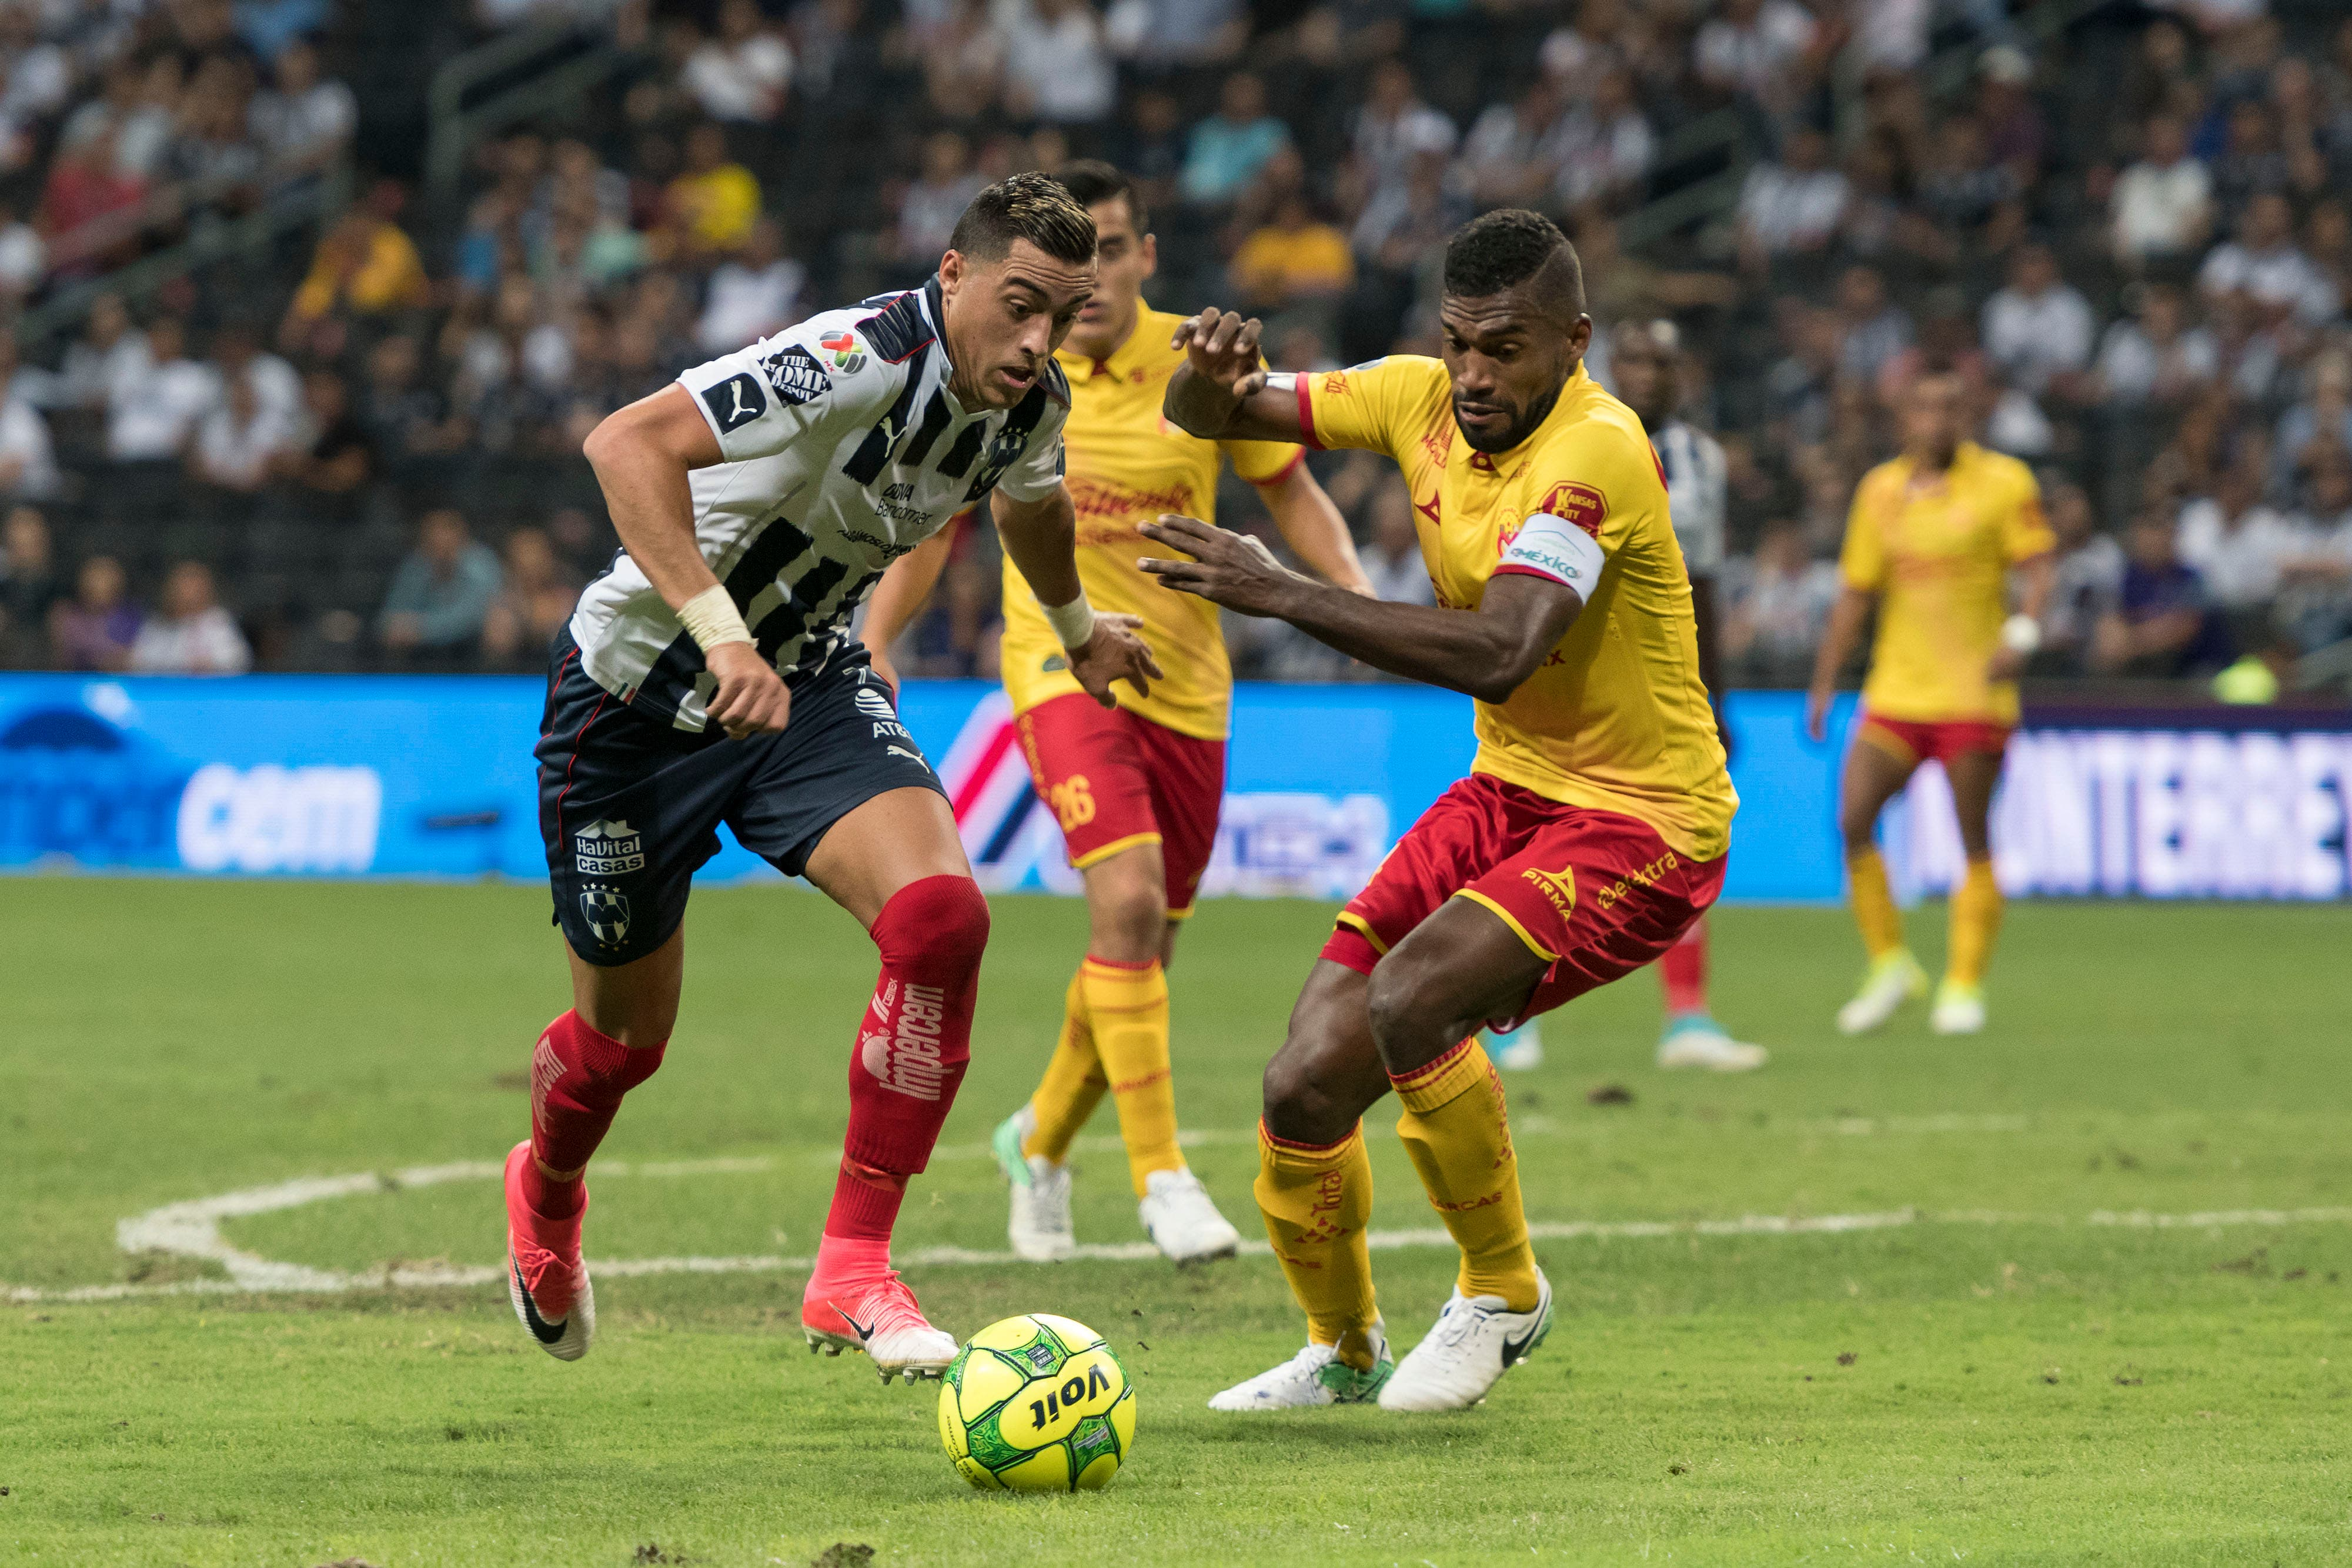 8e25e3958e35 Liga MX: Fechas y horarios de la Jornada 7 del Clausura 2019